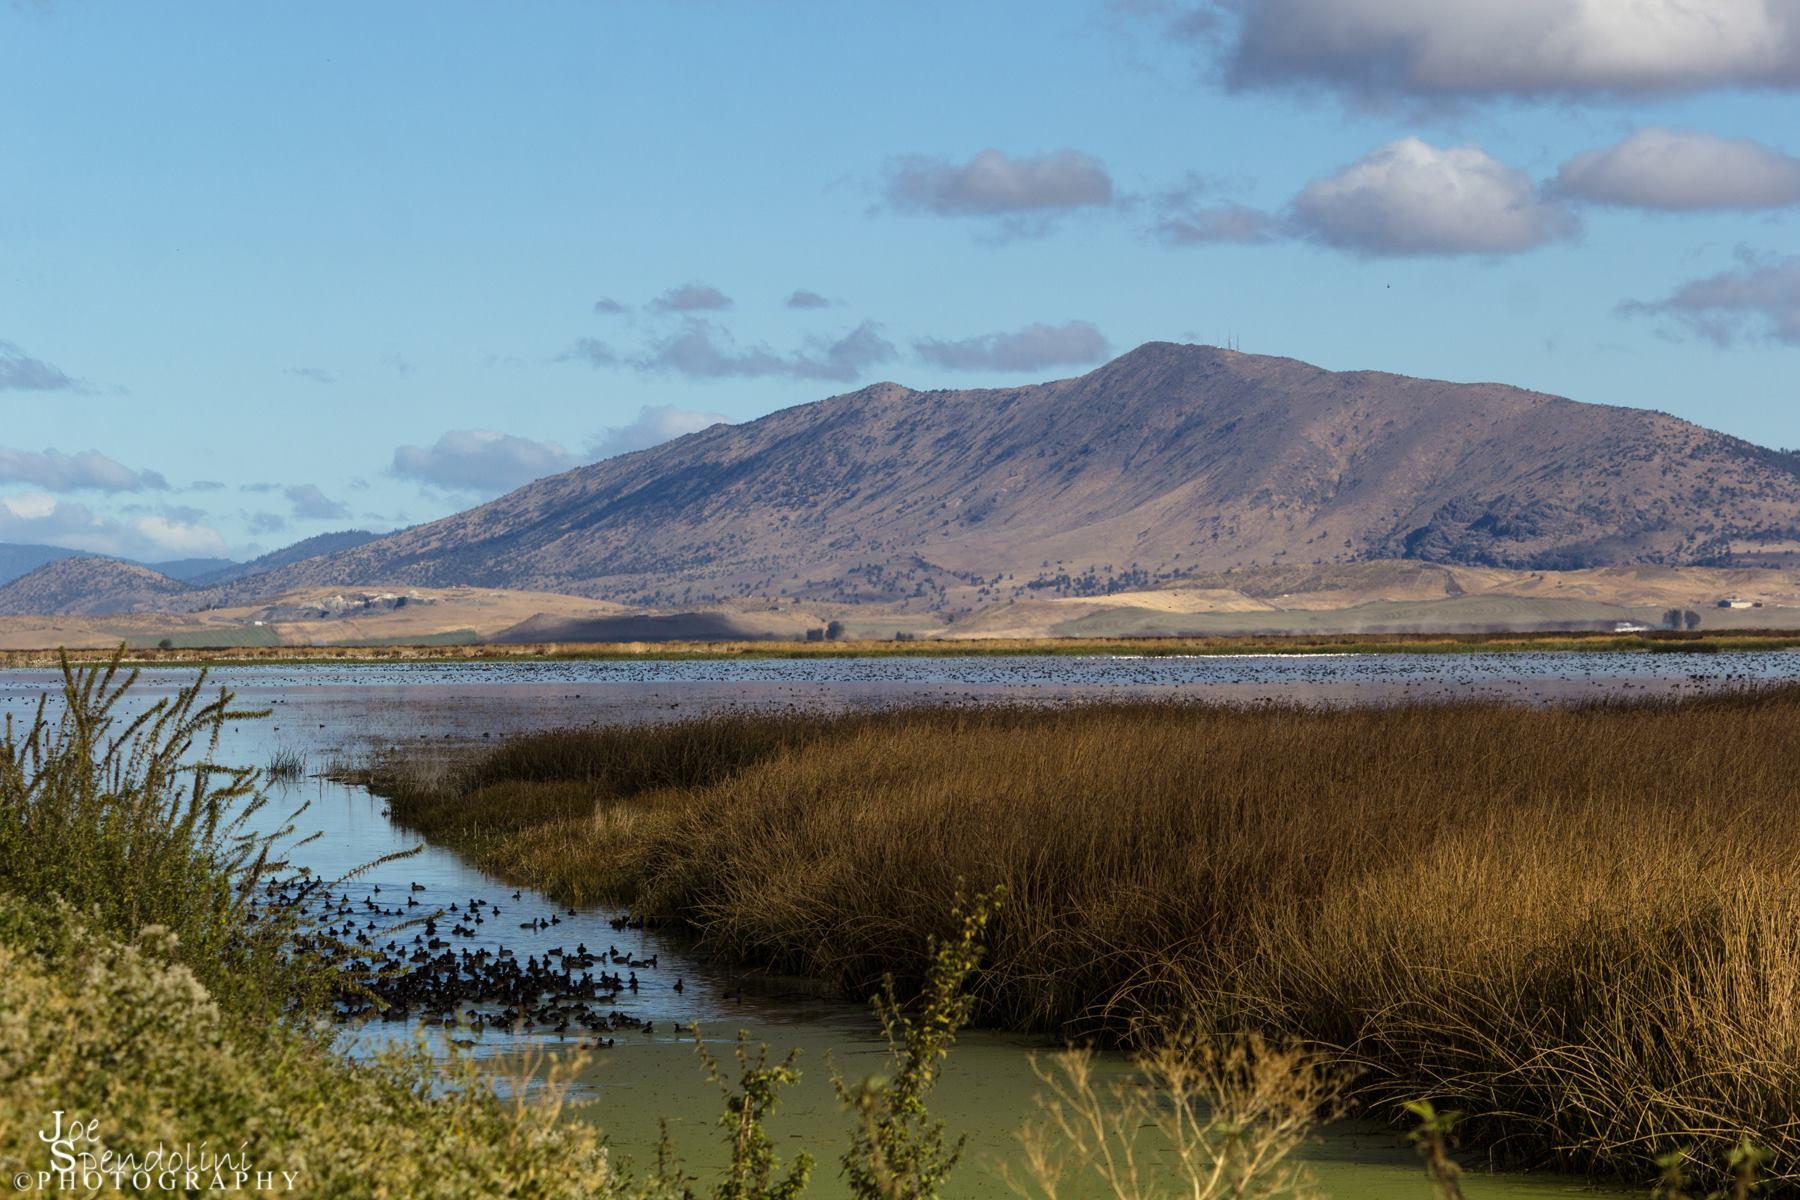 Wetlands are abundant throughout the Klamath Basin NWR Complex. This image shows, Stukel Mountain and wetlands of the Lower Klamath NWR.Image by  Joe Spendolini.